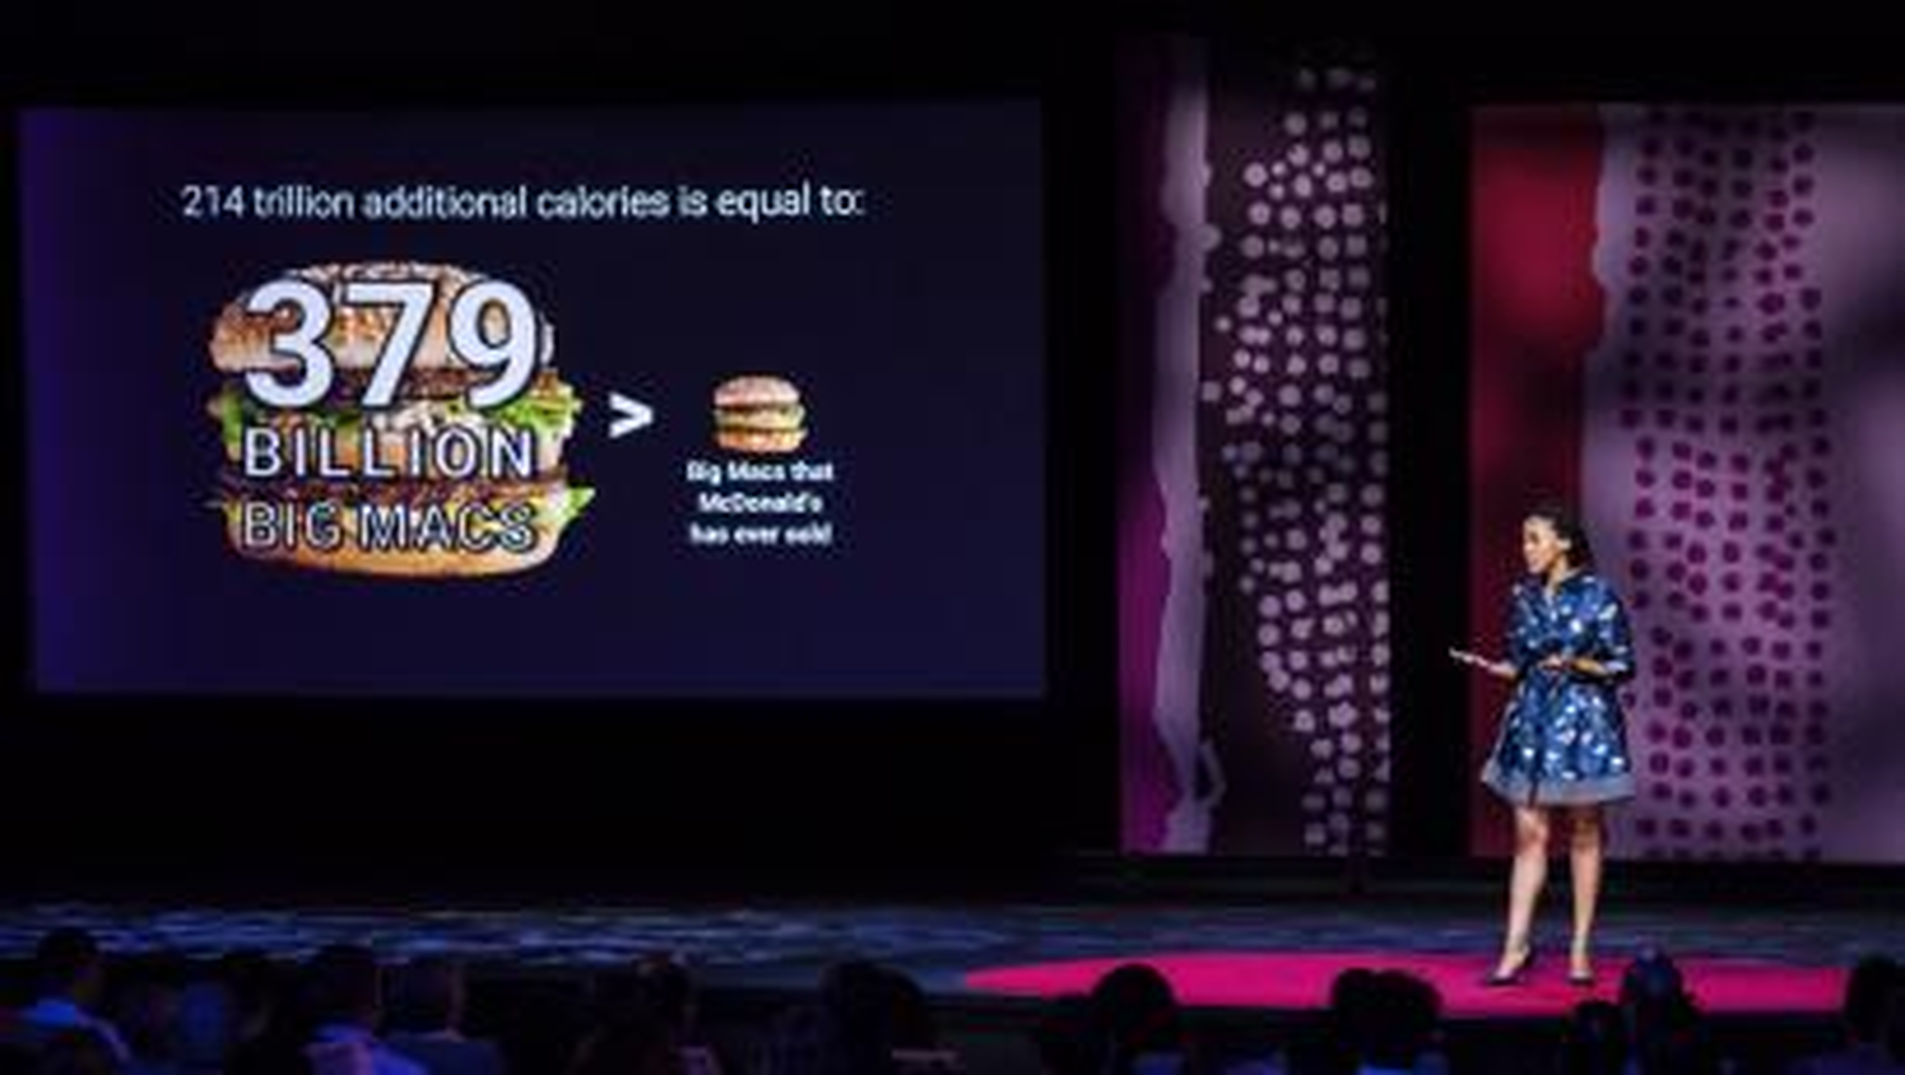 TEDGlobal: Sara Menker of Gro Intelligence says the world will be